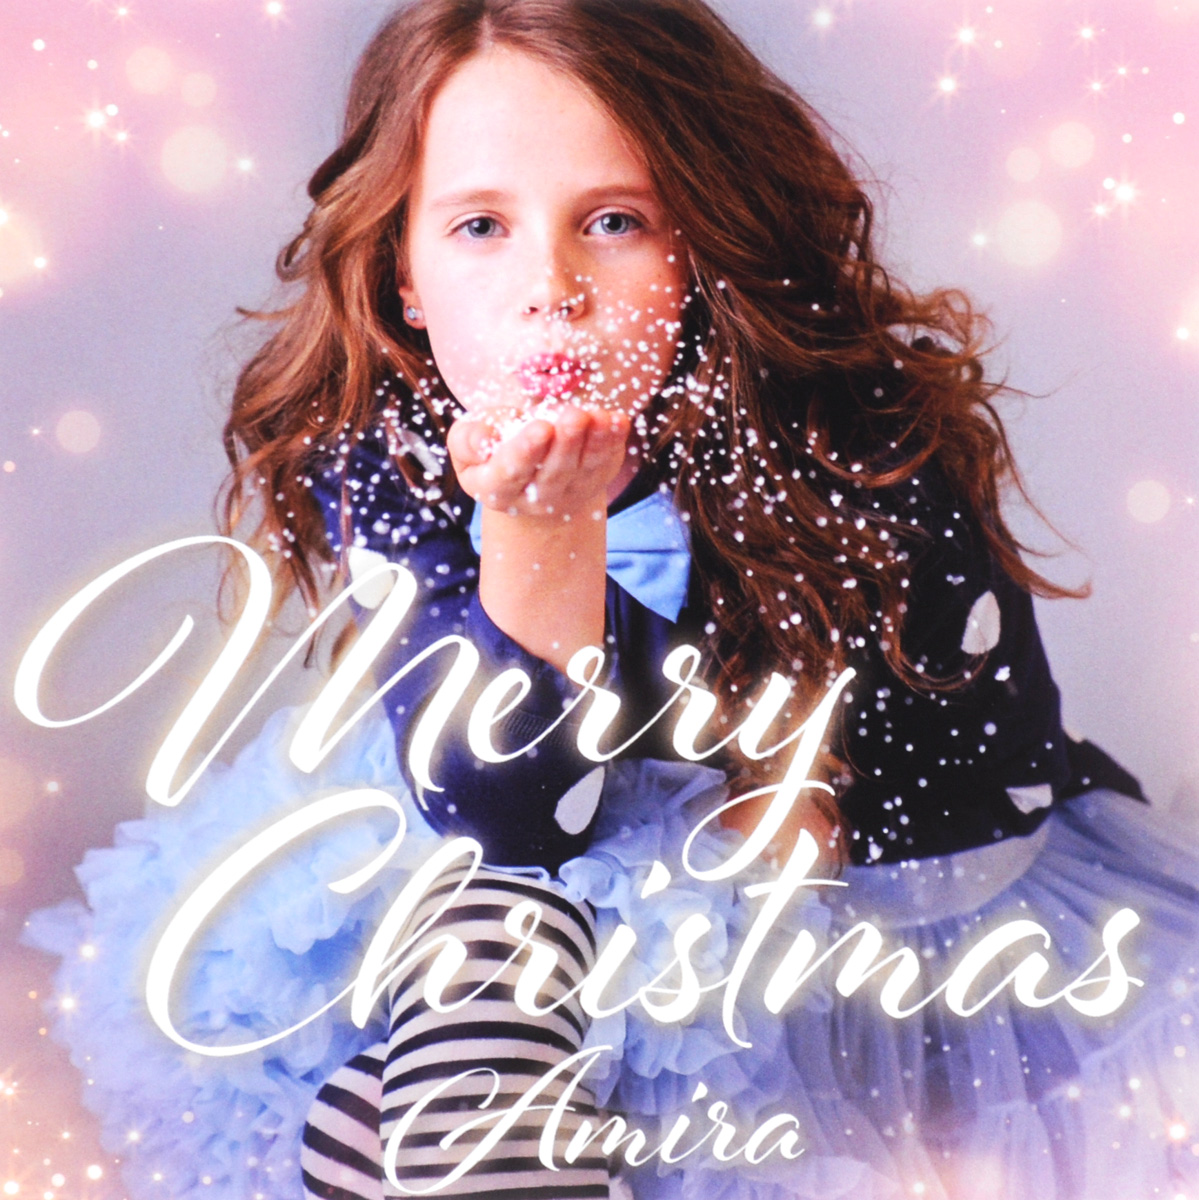 Amira. Merry Christmas